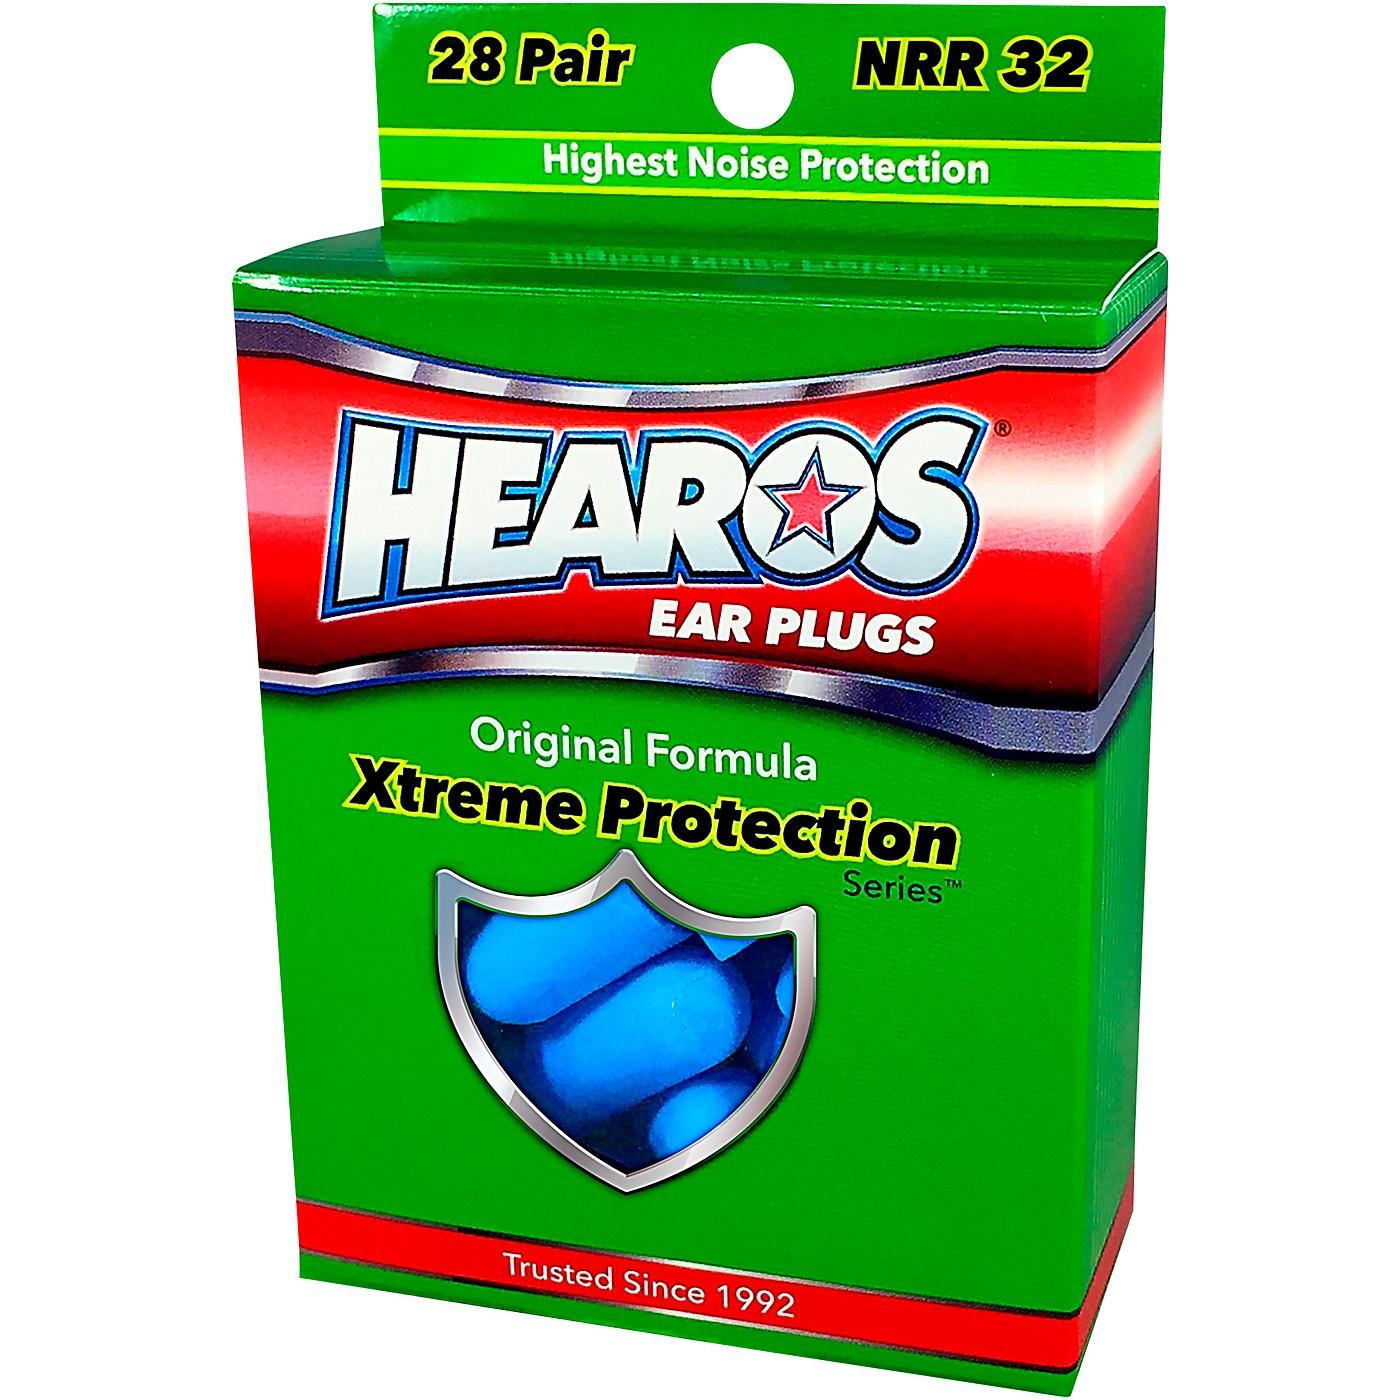 Hearos Xtreme Protection Series Ear Plugs 28 Pair thumbnail